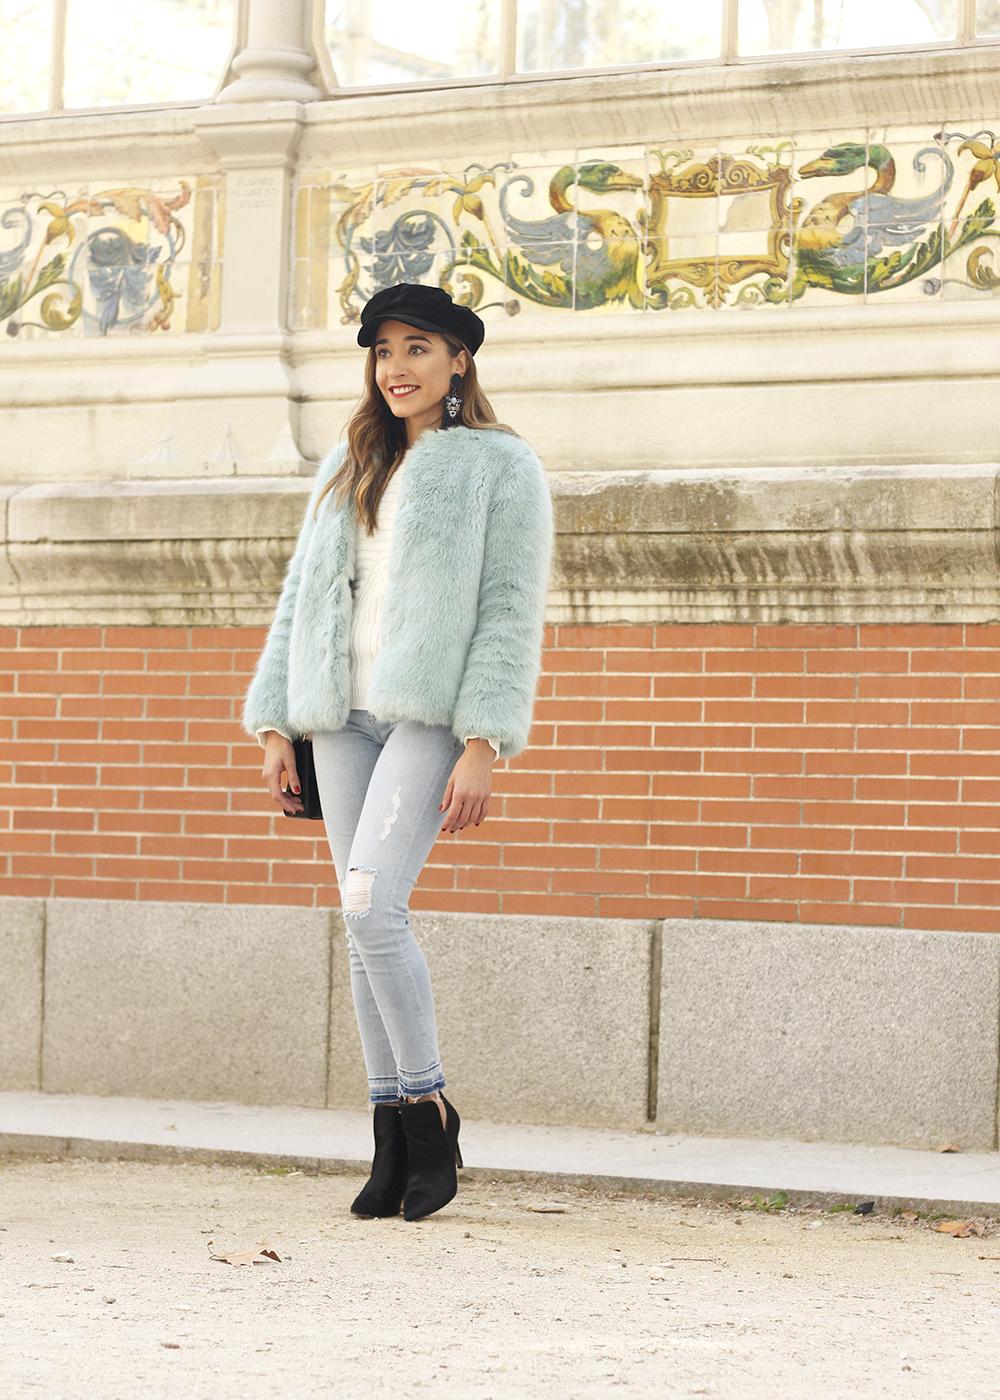 blue light faux fur coat navy cap ripped jeans zara tiger uterqüe earrings outfit street style02